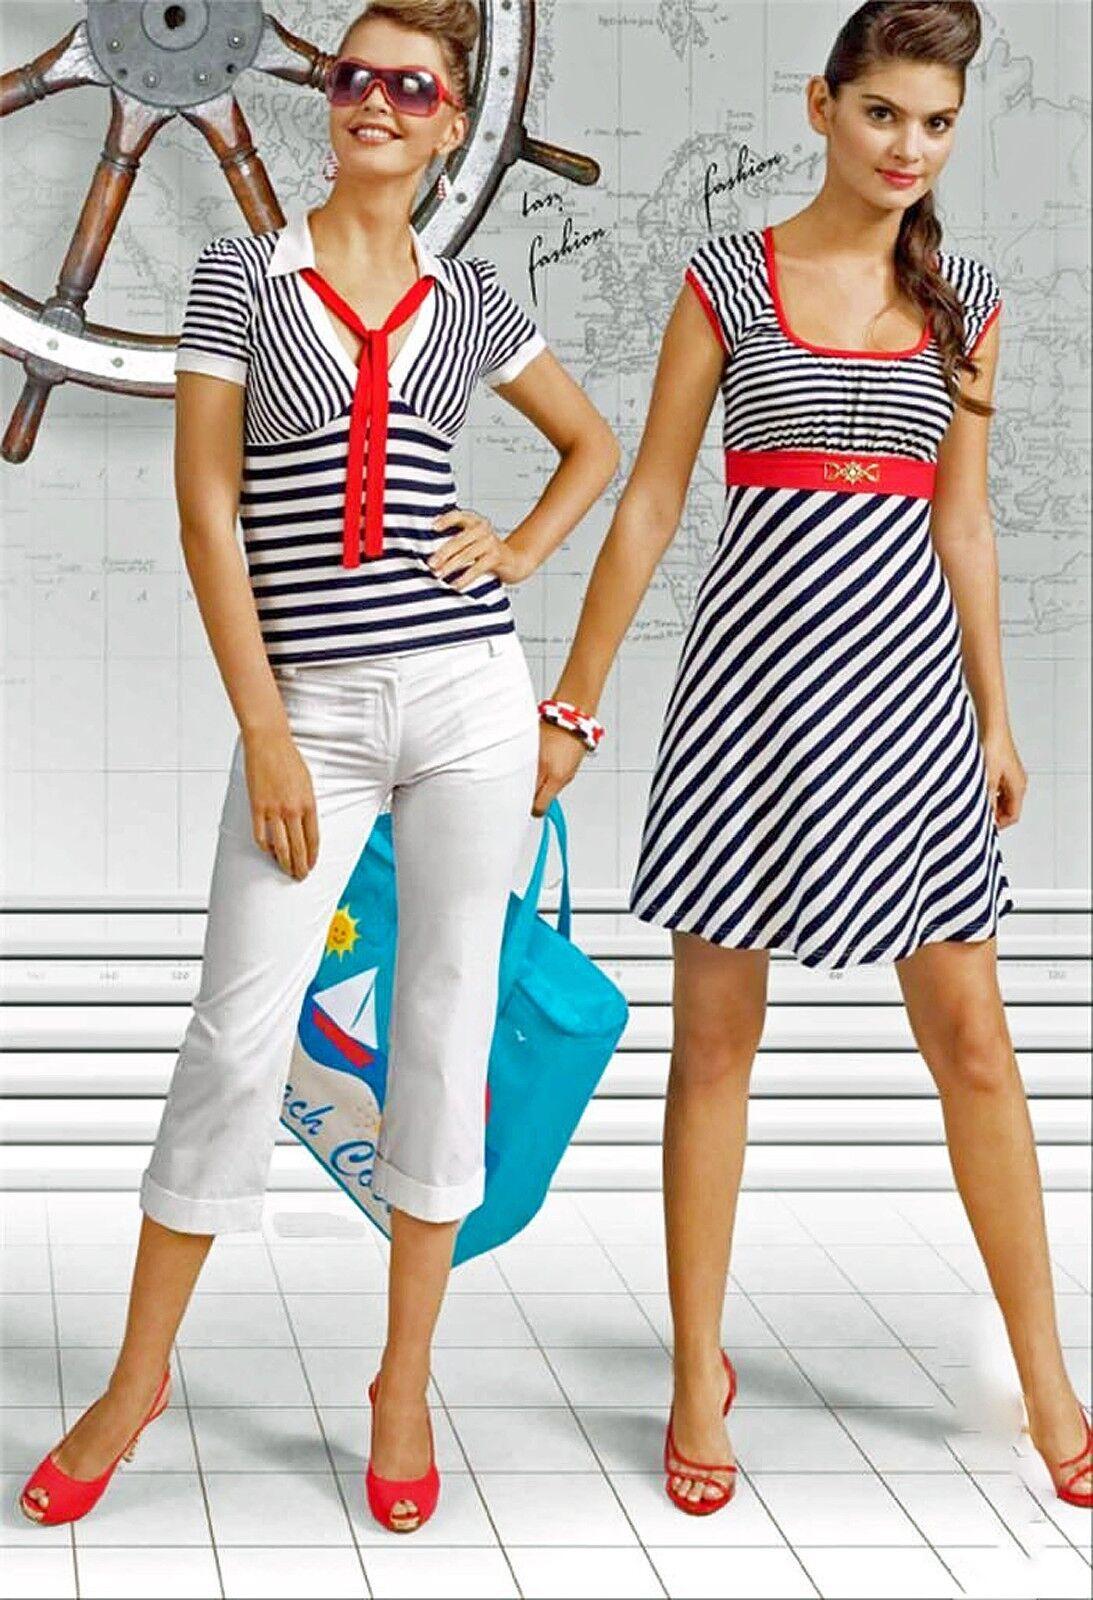 STRIPED SHORT DRESS SUMMER EUROPEAN MINI DRESS CAP SLEEVE ANCHOR DECOR